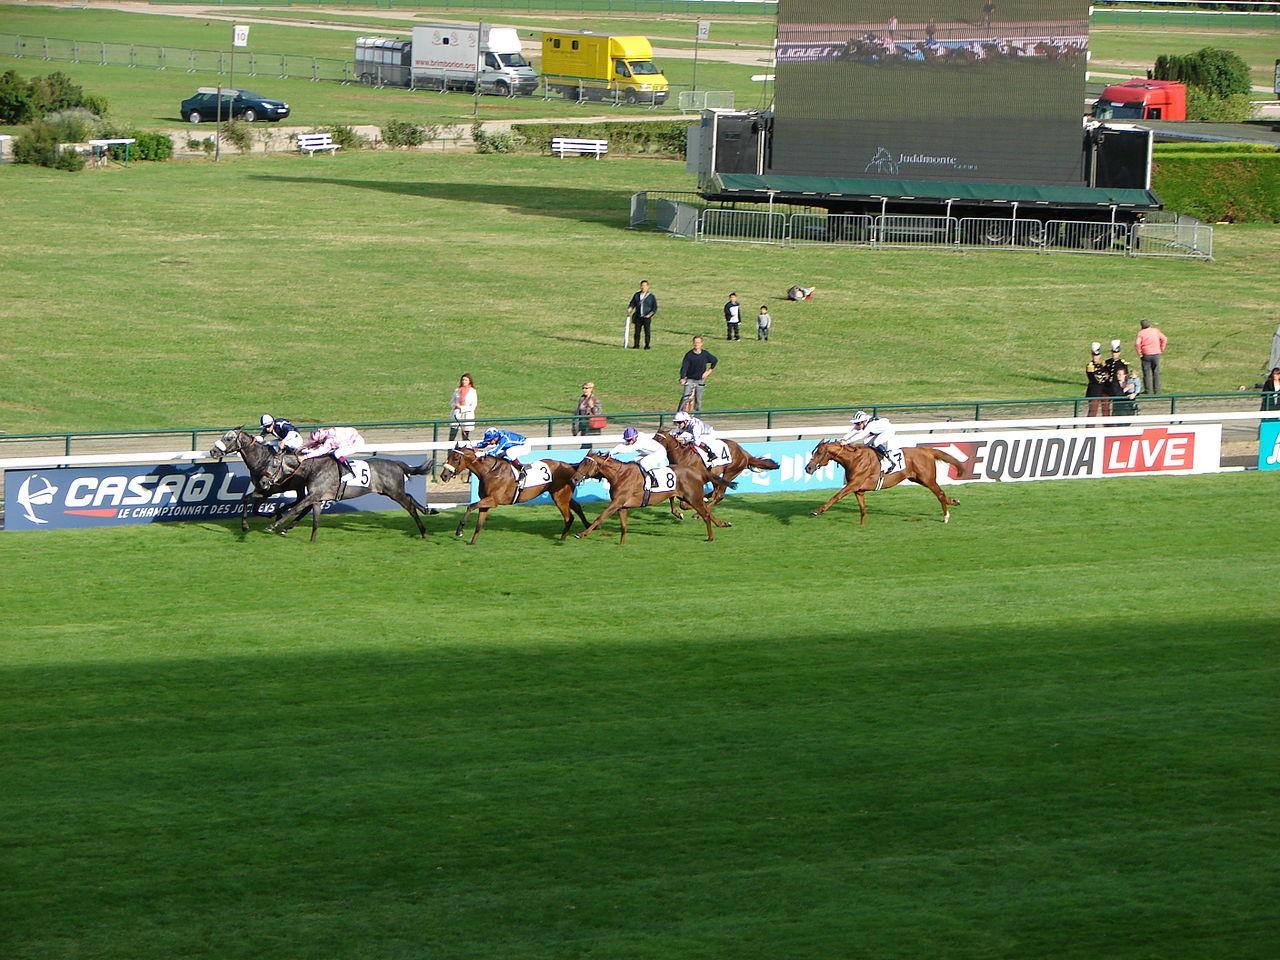 Arc betting tips 2 October from Longchamp including Prix Du Cadran